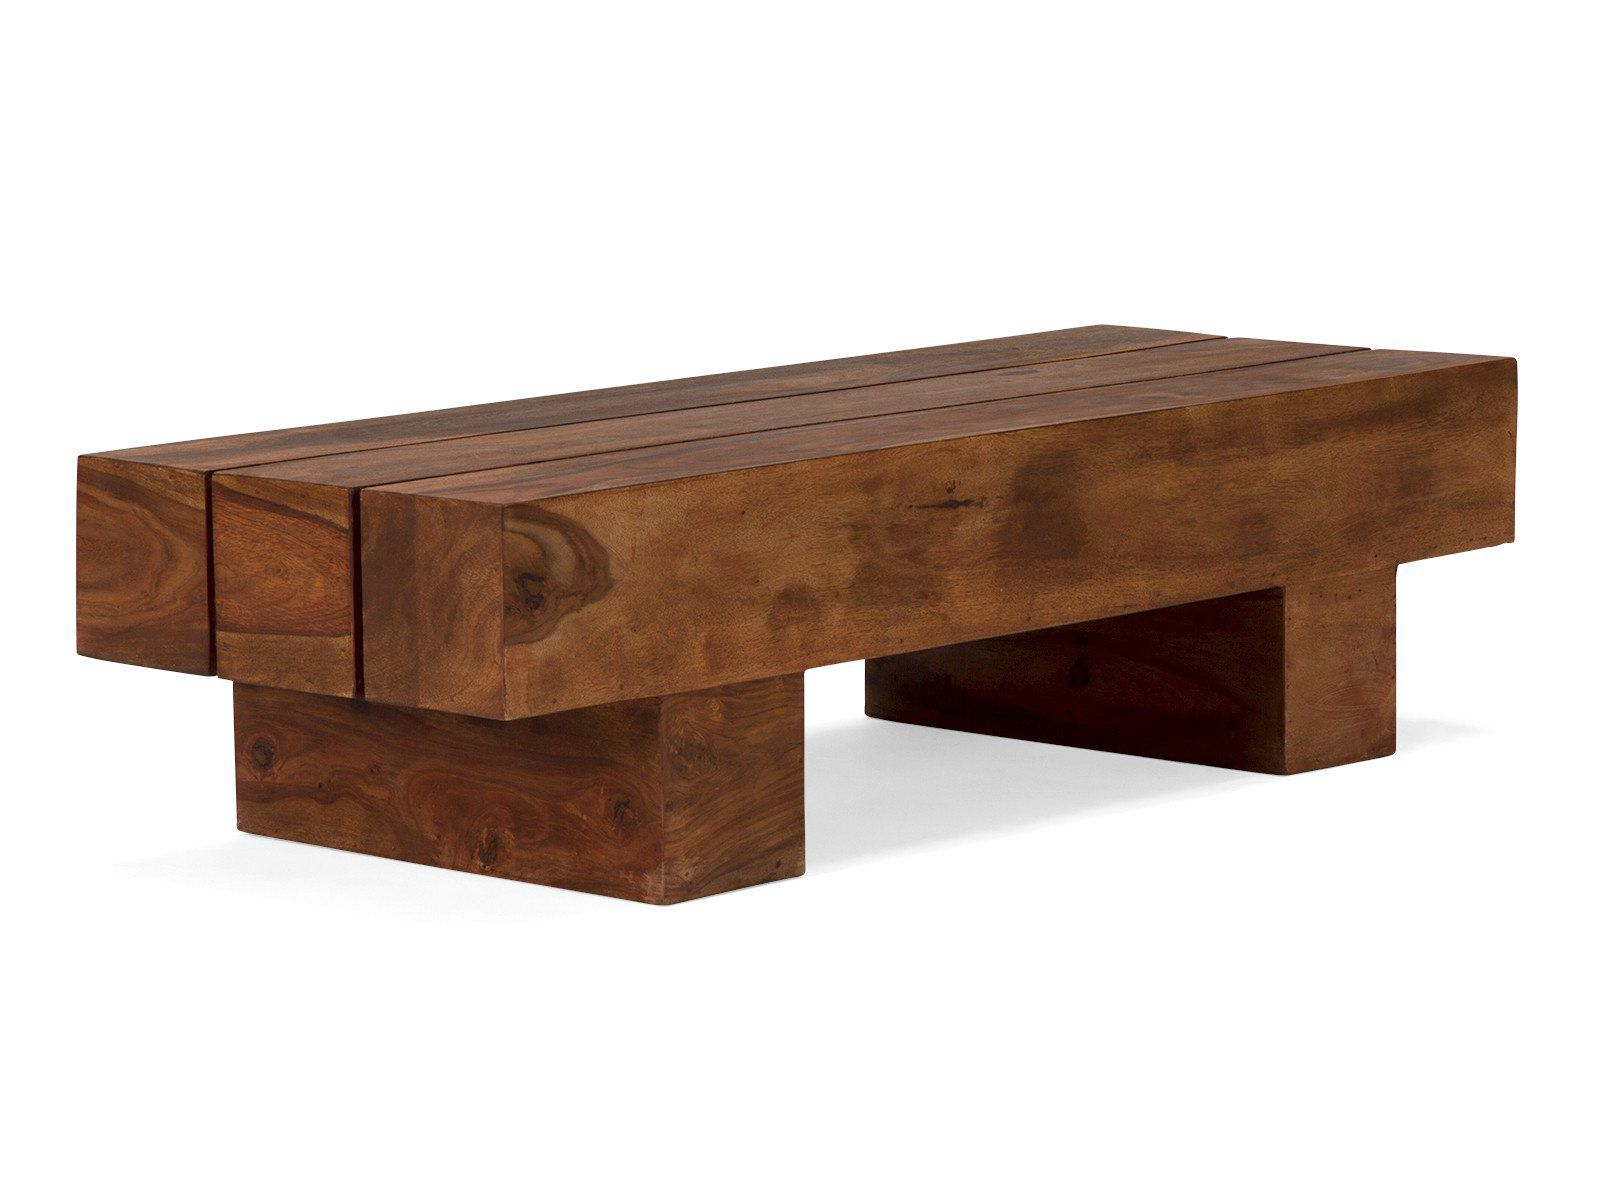 couchtisch dunkelbraun simple couchtisch antik gebeizt ideen couchtisch dunkelbraun modern. Black Bedroom Furniture Sets. Home Design Ideas